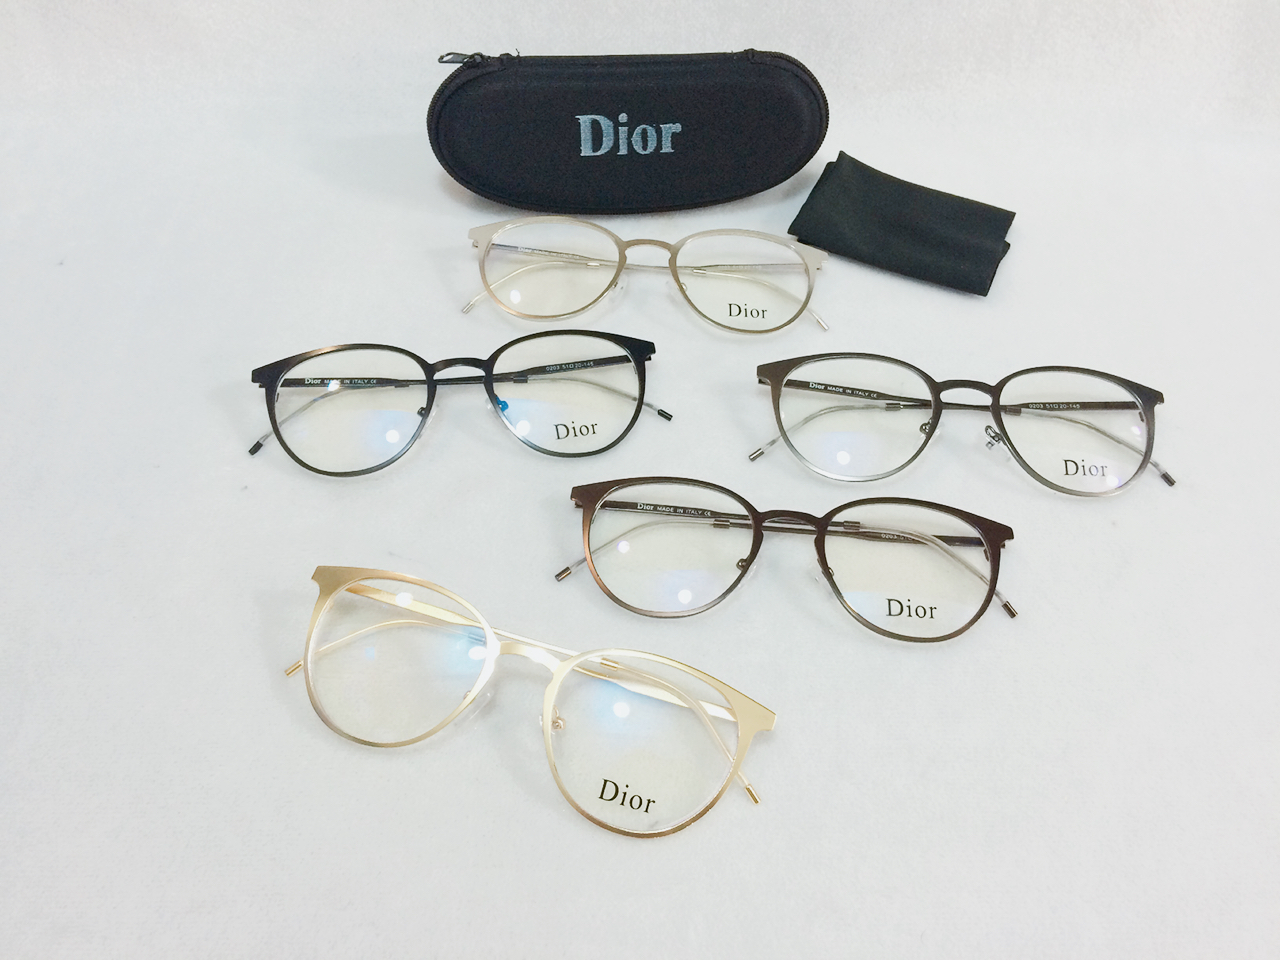 Jual BEST!! Frame Kacamata Minus Dior SM 0203 Wanita Pria Hi ... 86747f5a8c